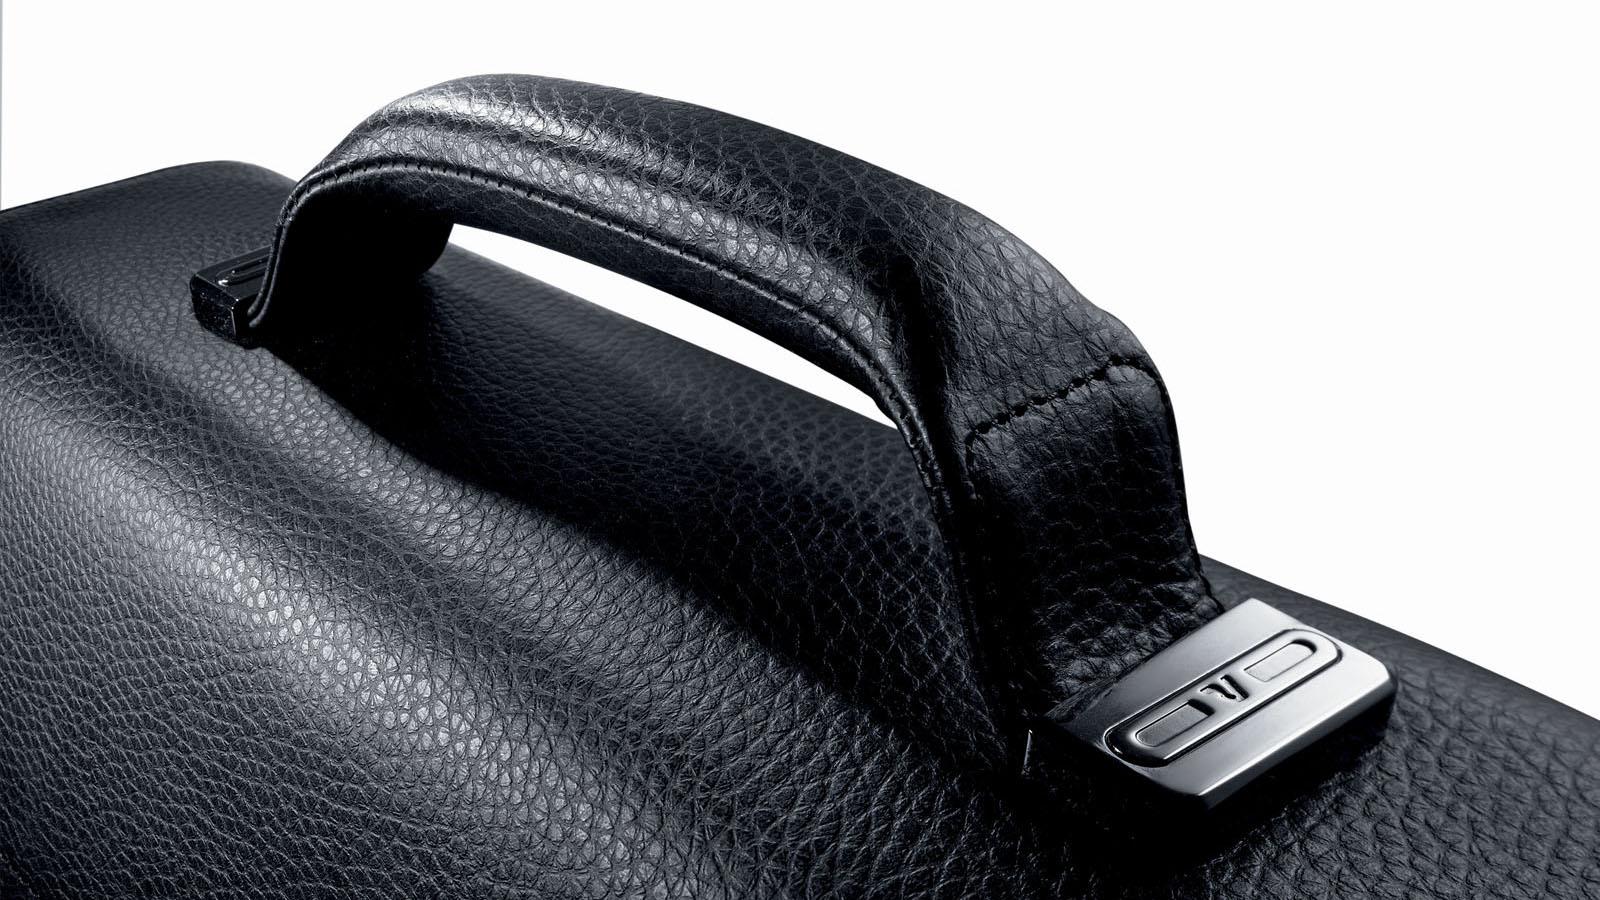 laptop-bag-collection-xelle-manico